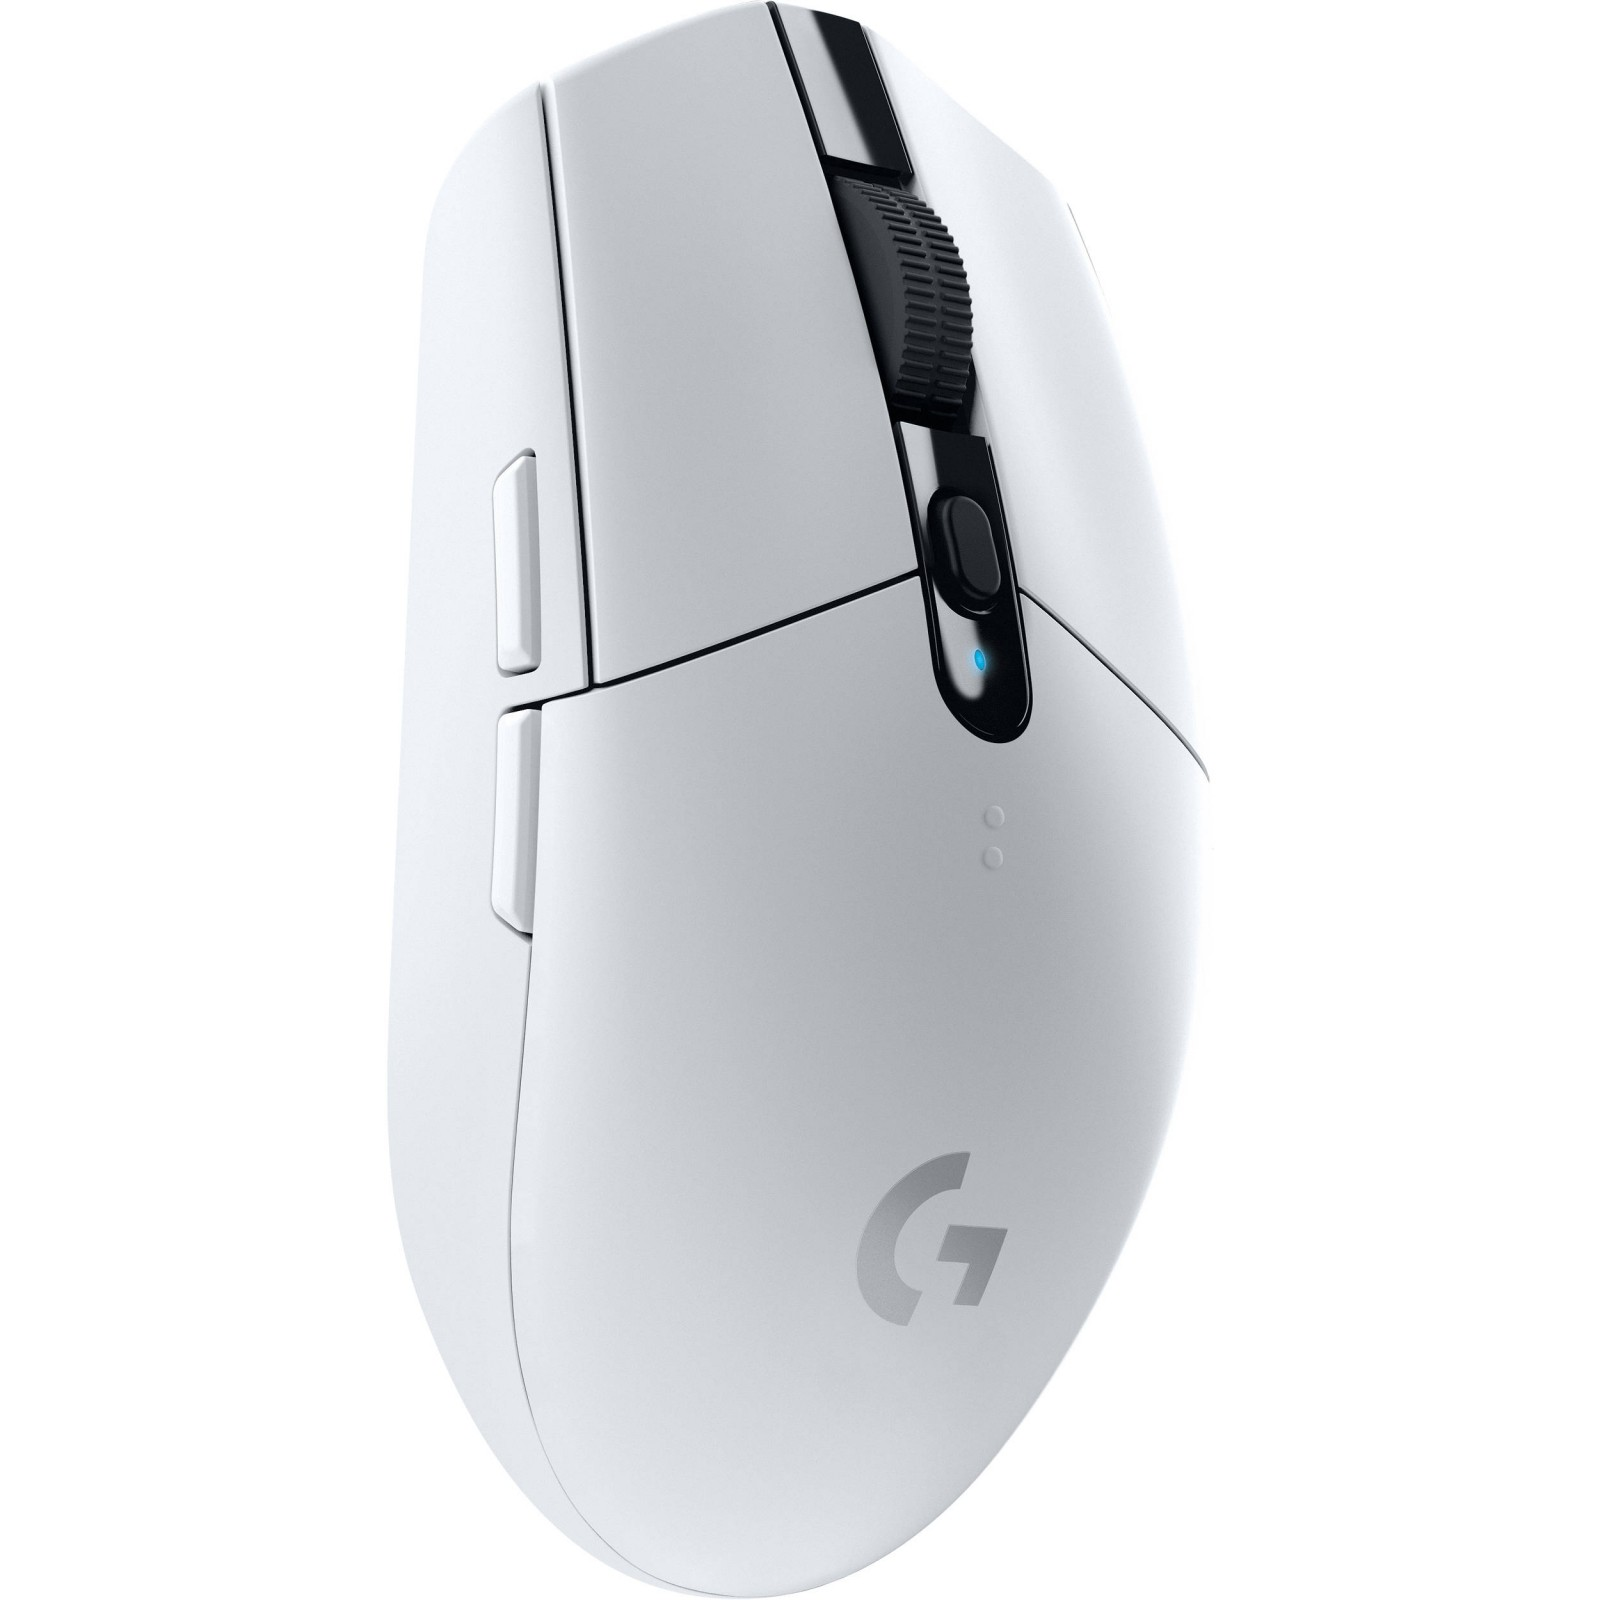 425beeafeeb Logitech G305 LightSpeed Wireless Gaming Mouse White | 910-005292 ...